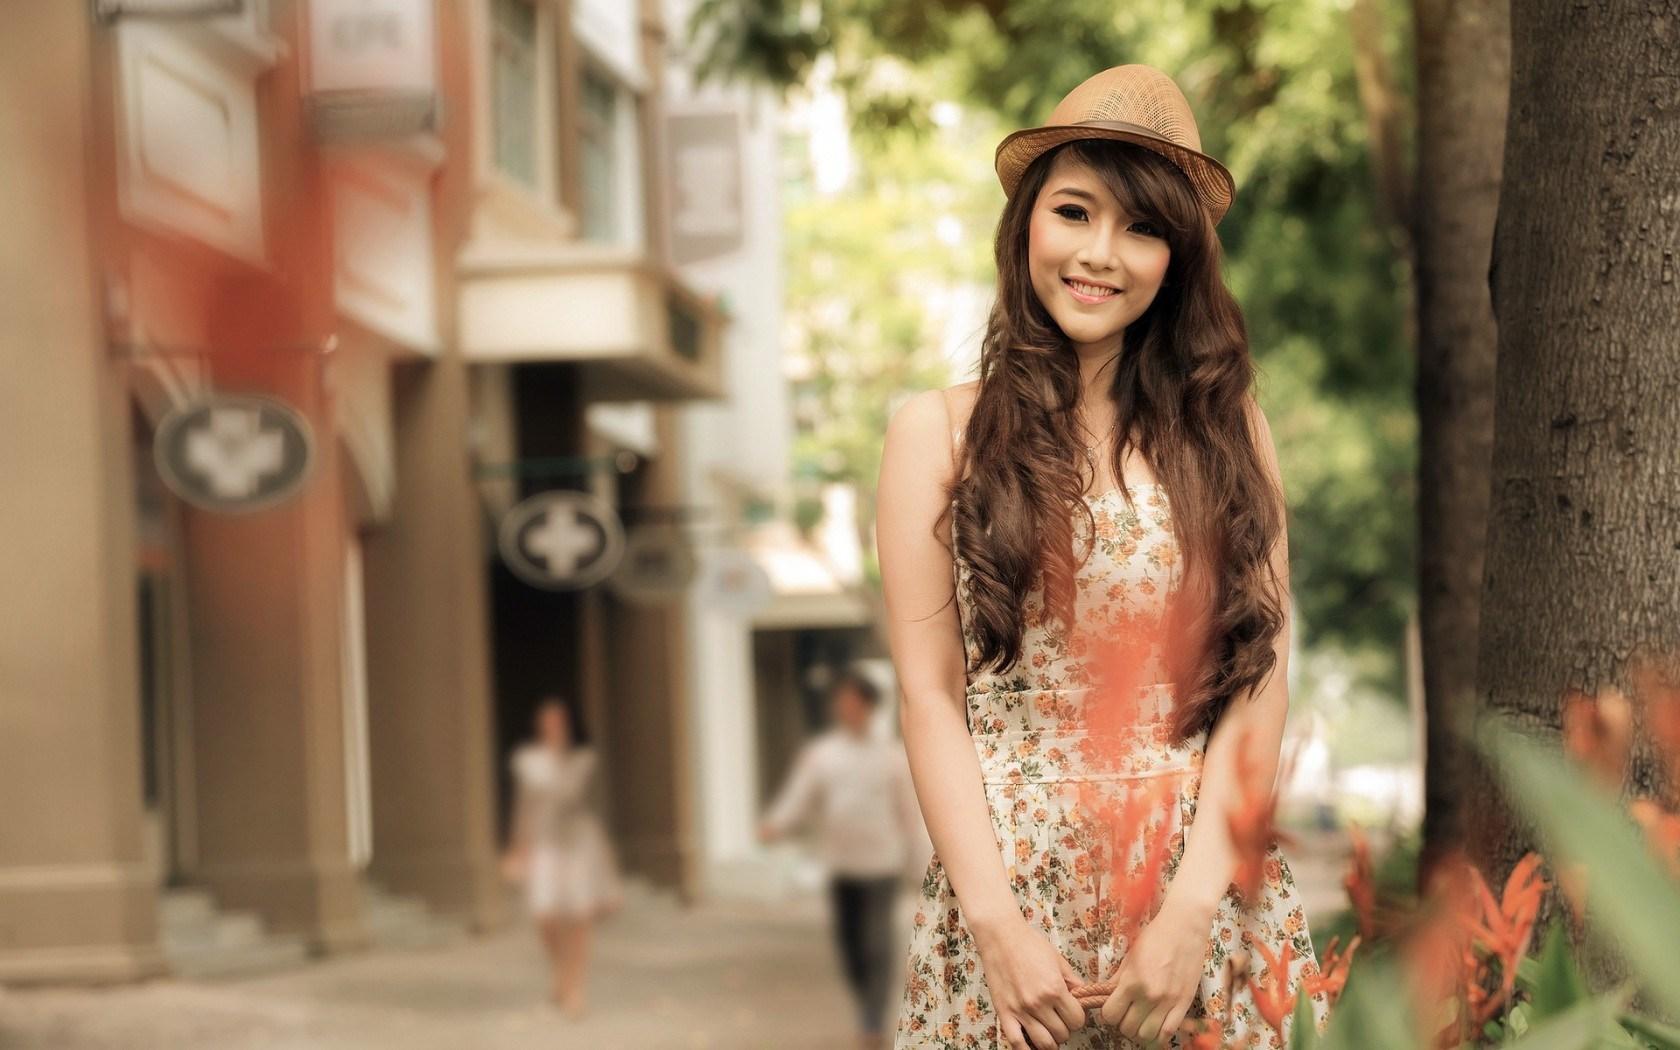 Lovely Girl Asian City Street Floral Dress HD Wallpaper